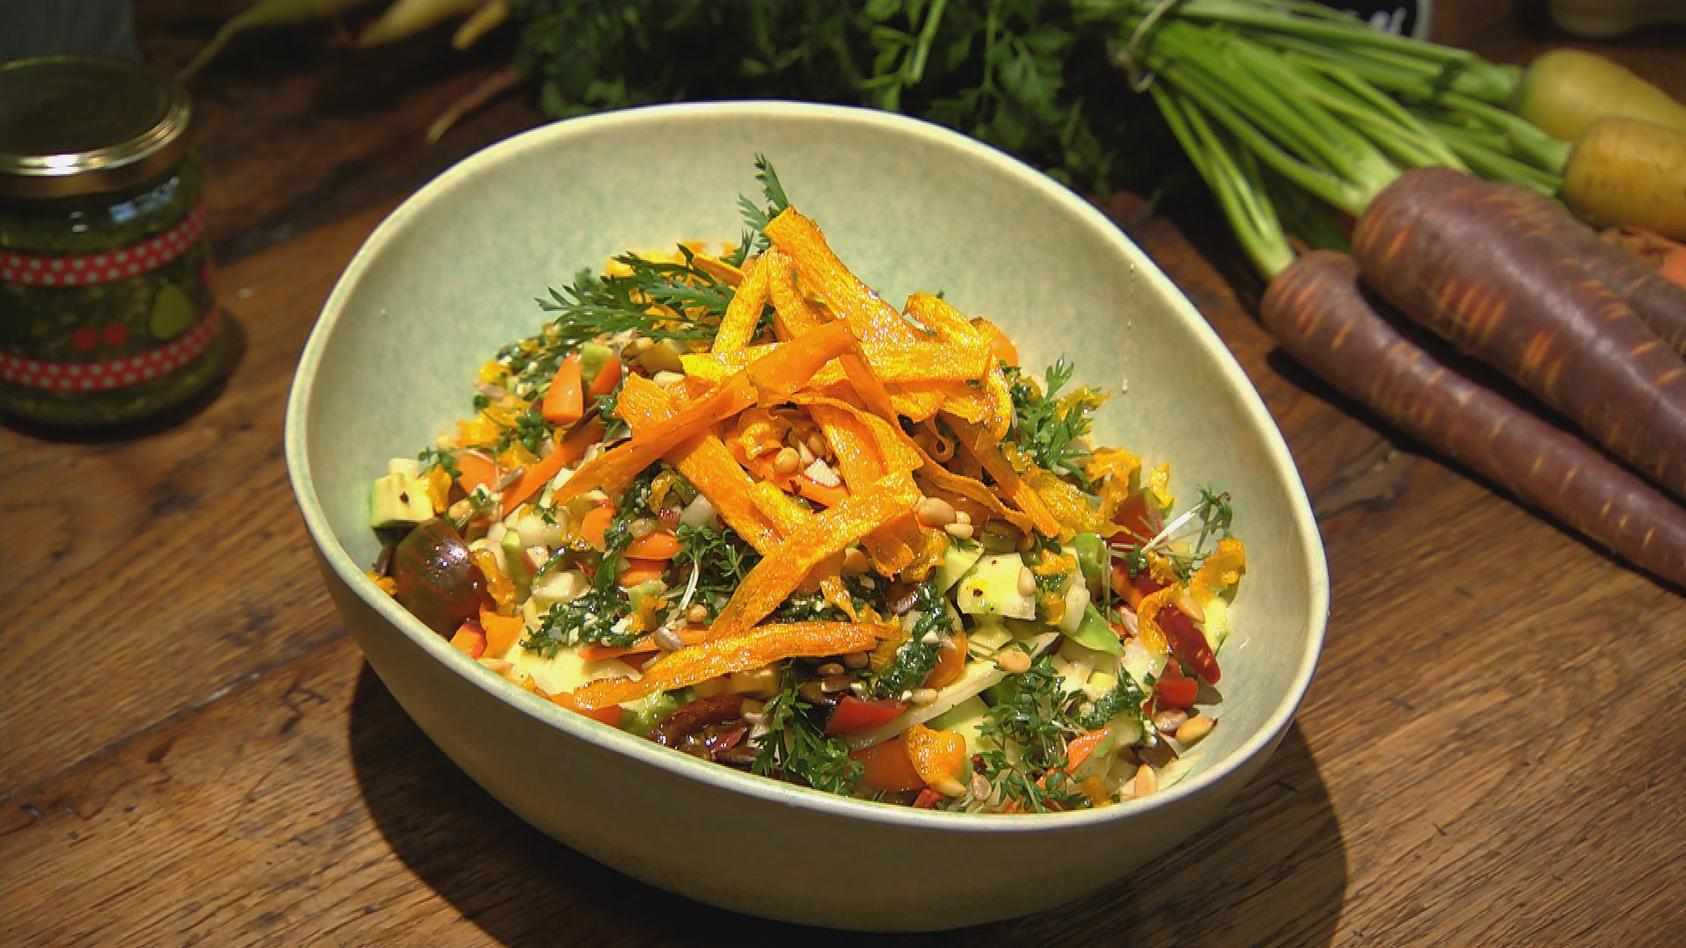 Flotte Karotte – Gerichte mit unserer Lieblingswurzel: Möhren-Avocado-Salat